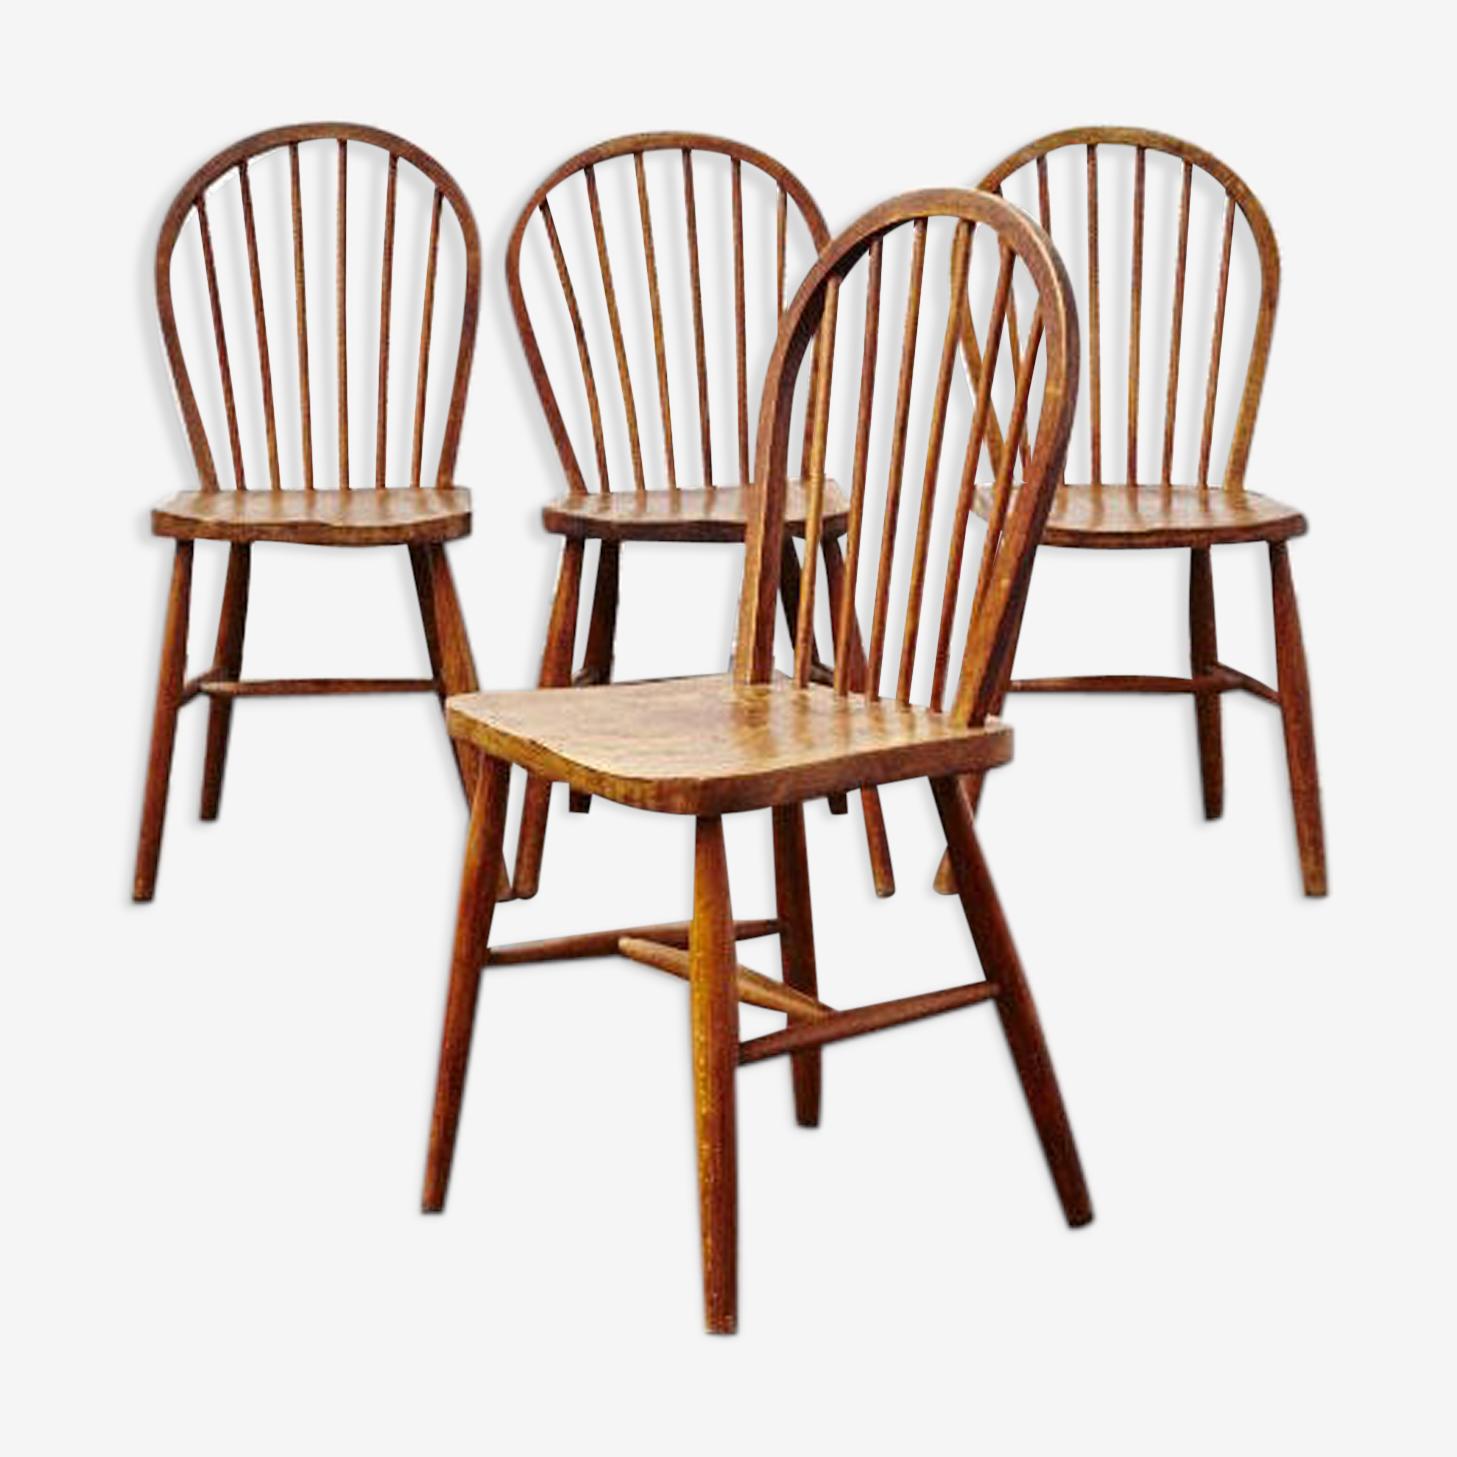 Série de 4 chaises Ercol